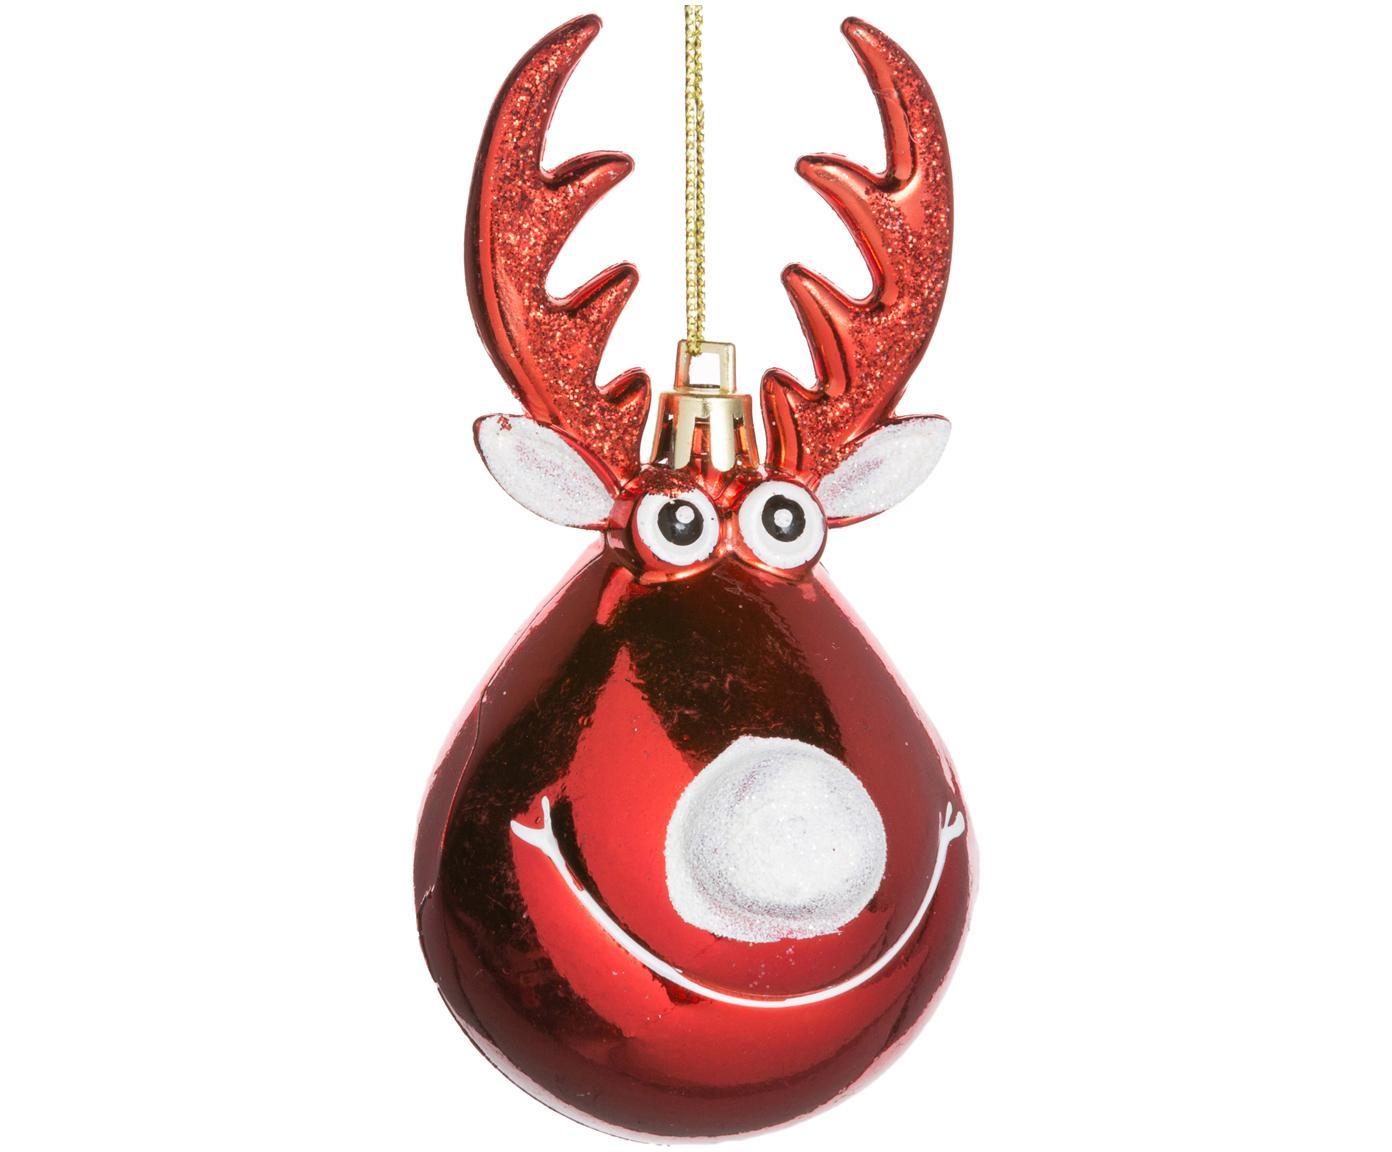 Boomhanger  Rudolph, 2 stuks, Kunststof, Kerst rood, wit, goudkleurig, Ø 5 x H 12 cm